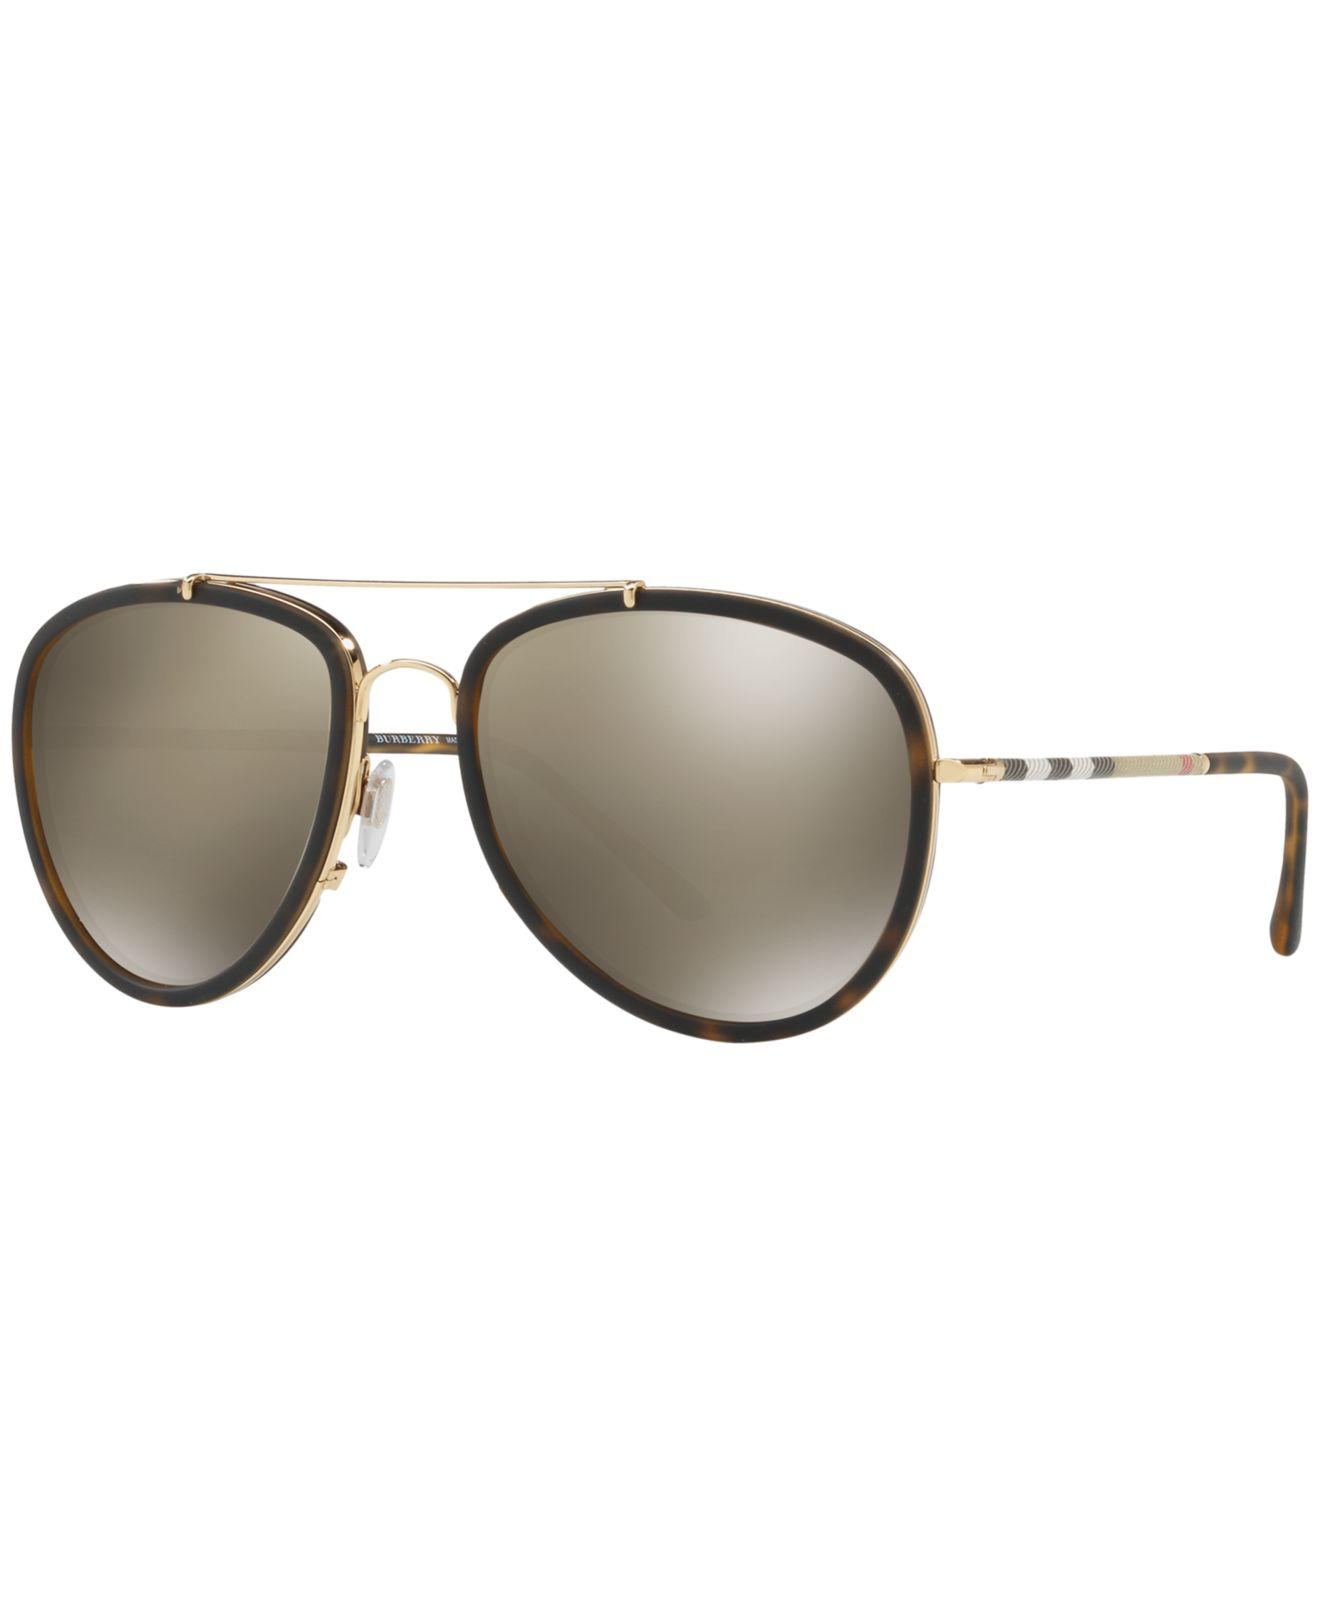 10973dab7fb Burberry. Men s Brown Sunglasses ...